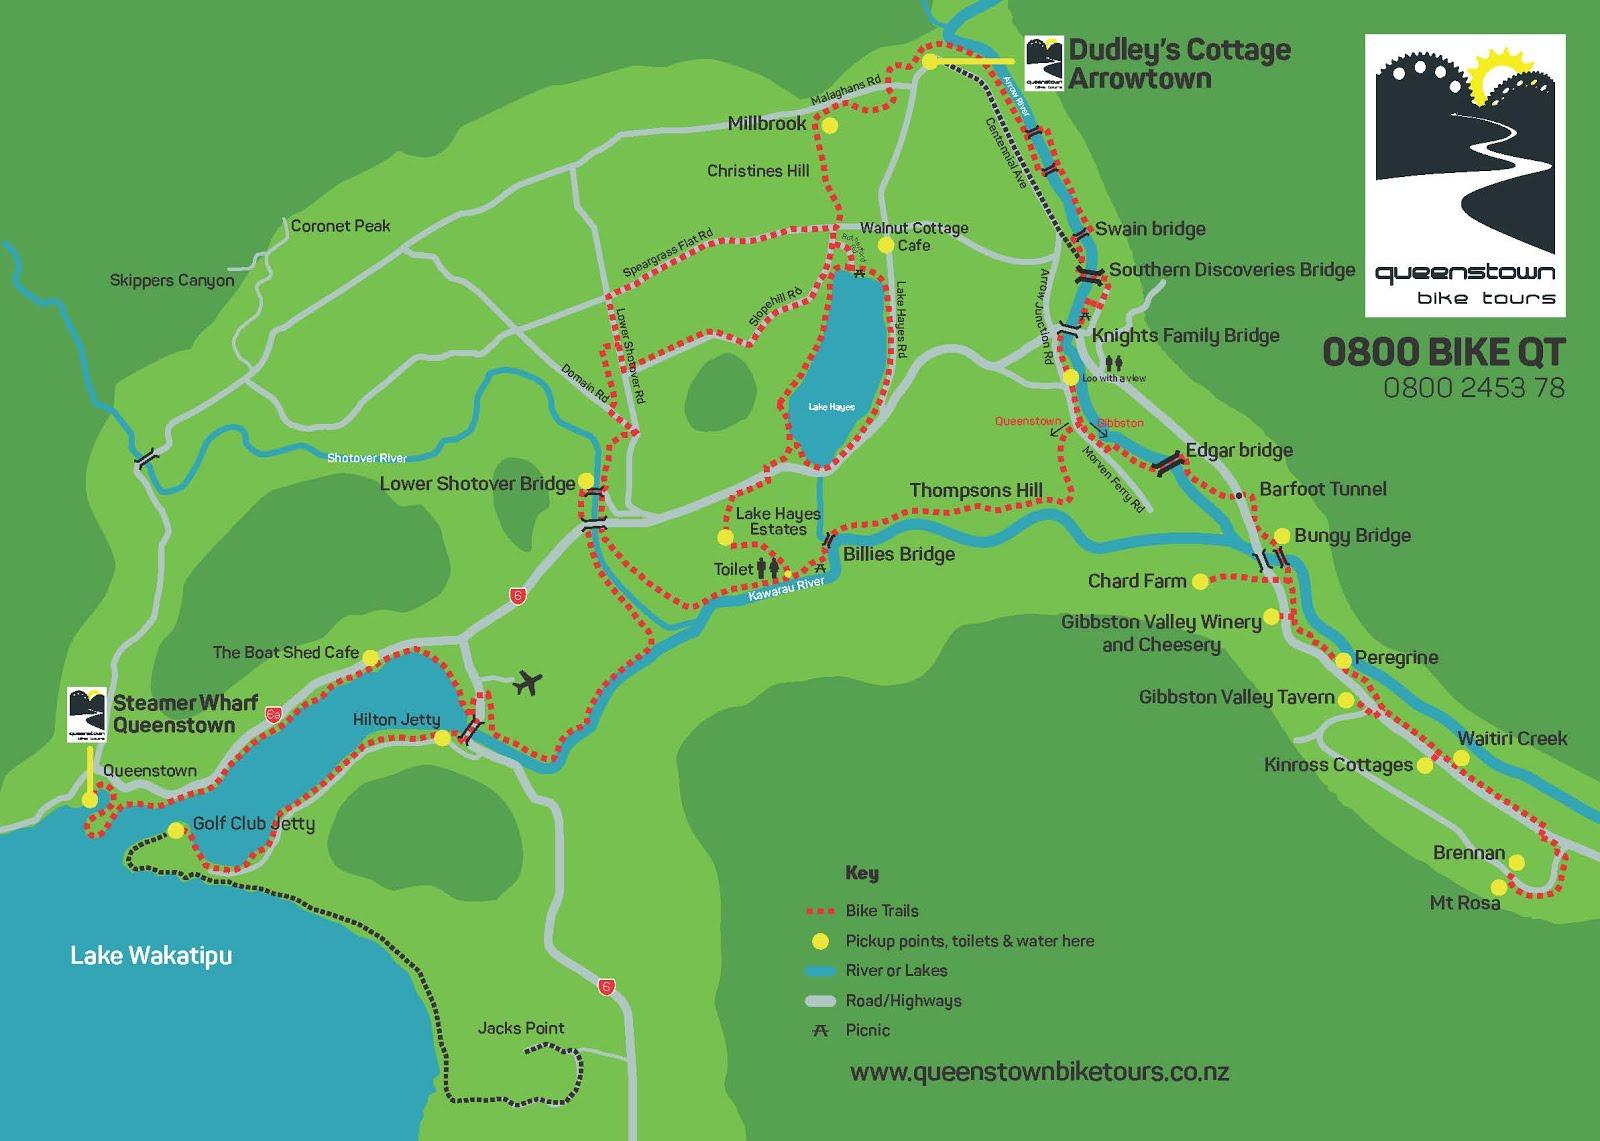 map from queenstown bike tours website